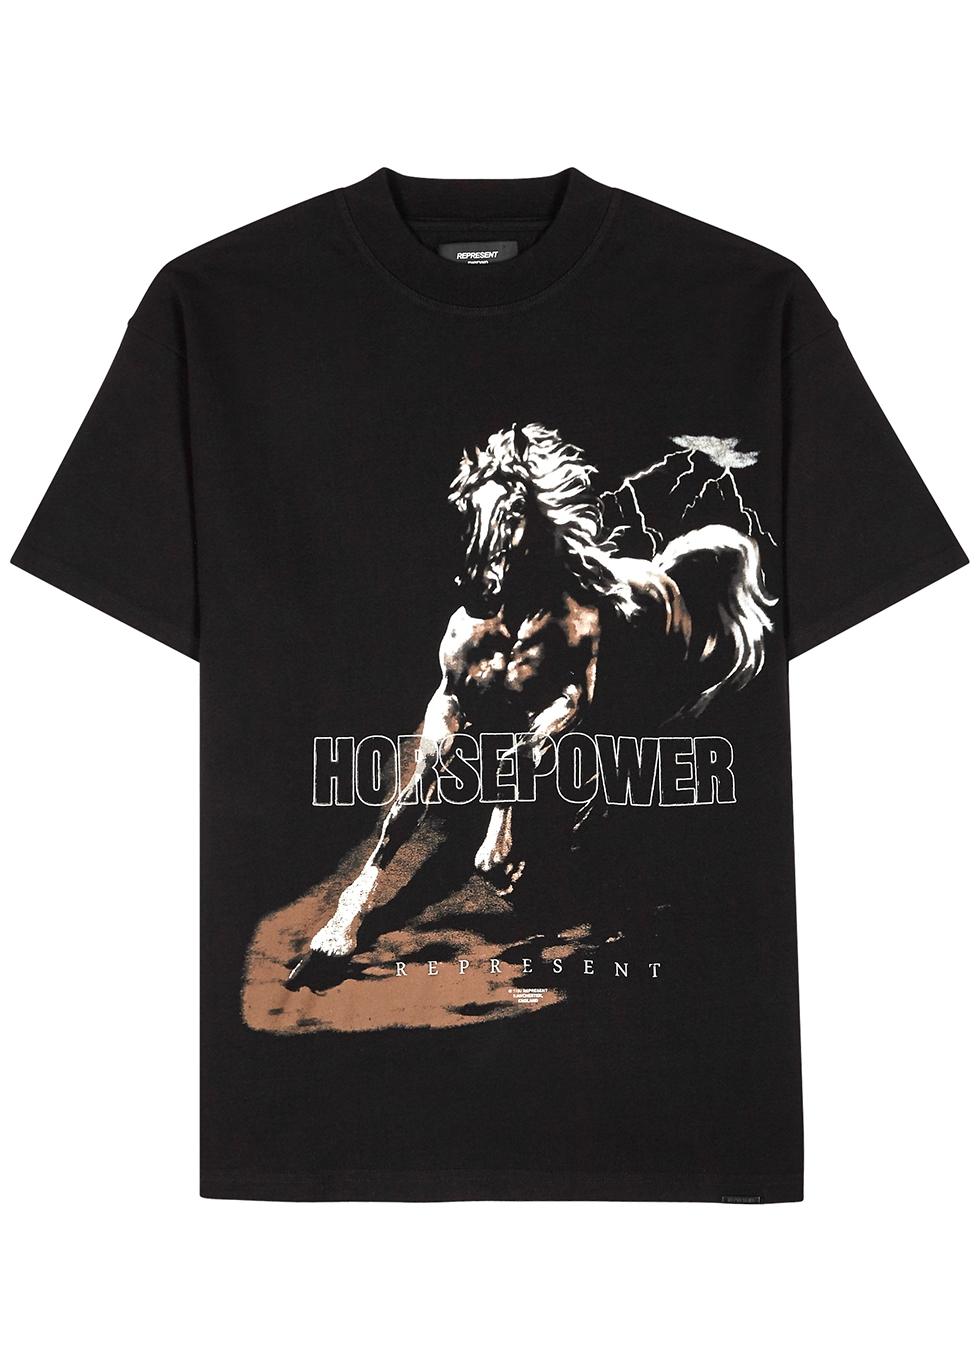 Horsepower black printed cotton T-shirt